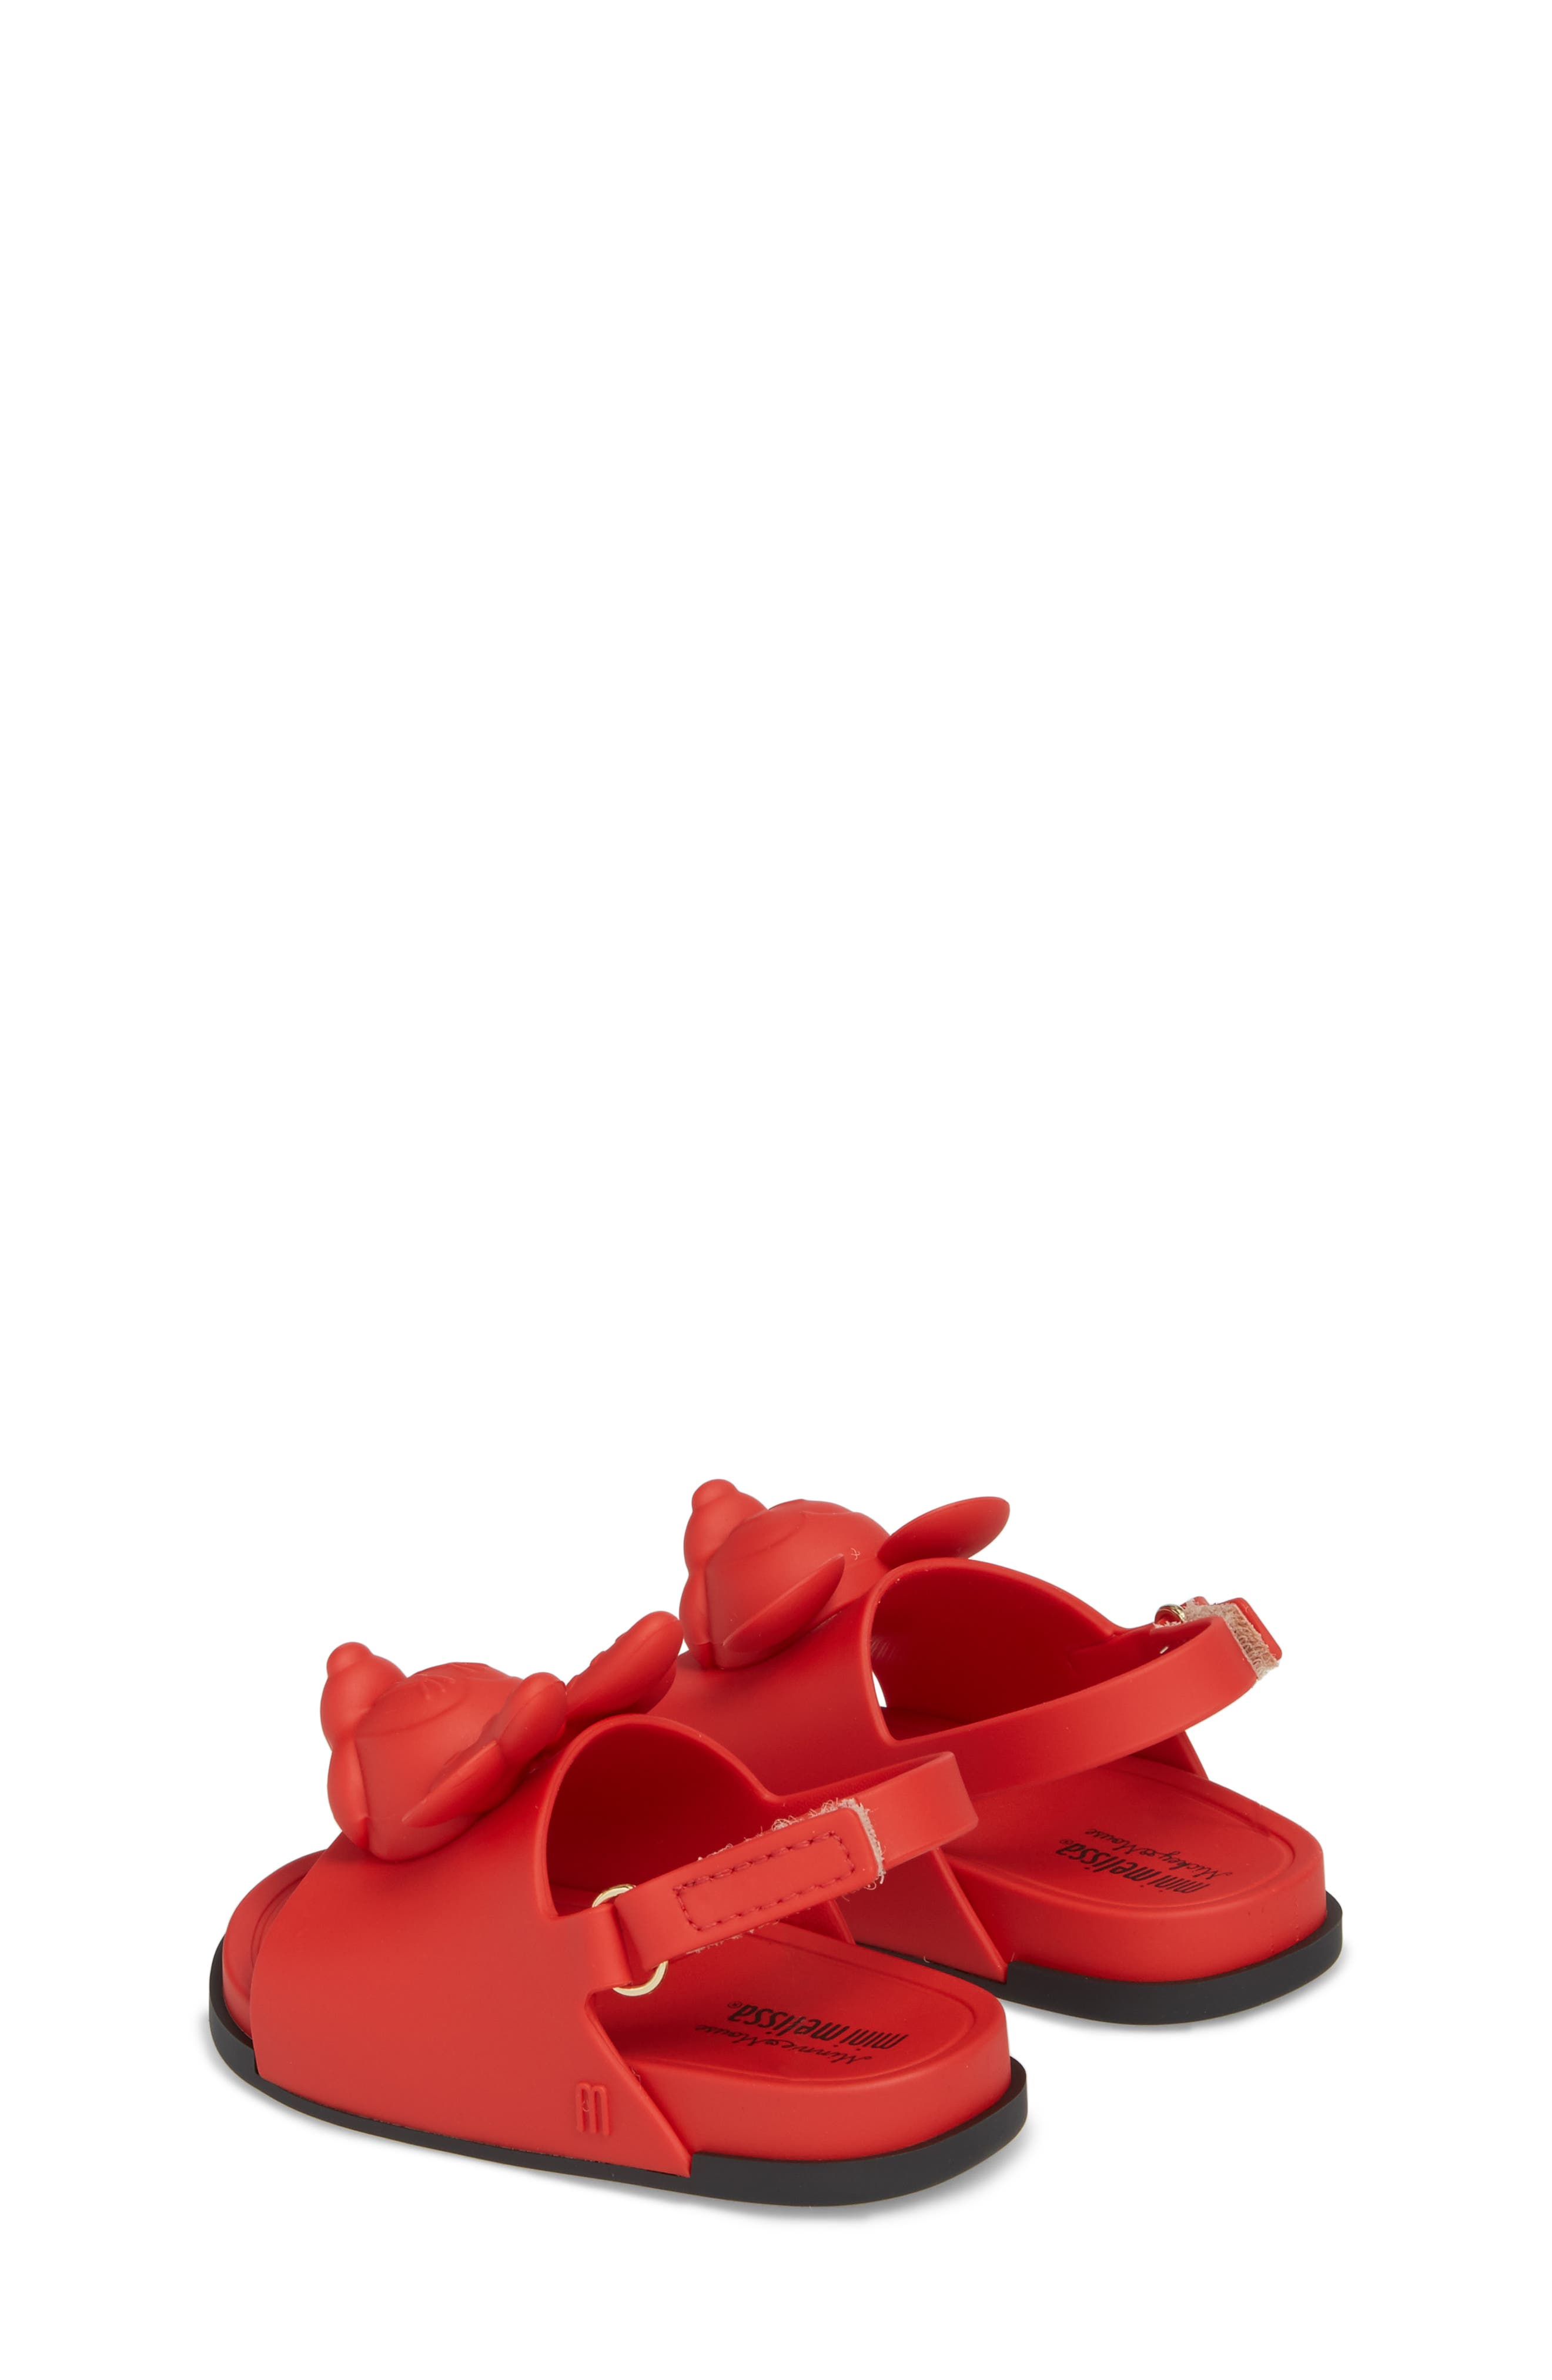 Disney<sup>®</sup> Mini Beach Sandal,                             Alternate thumbnail 11, color,